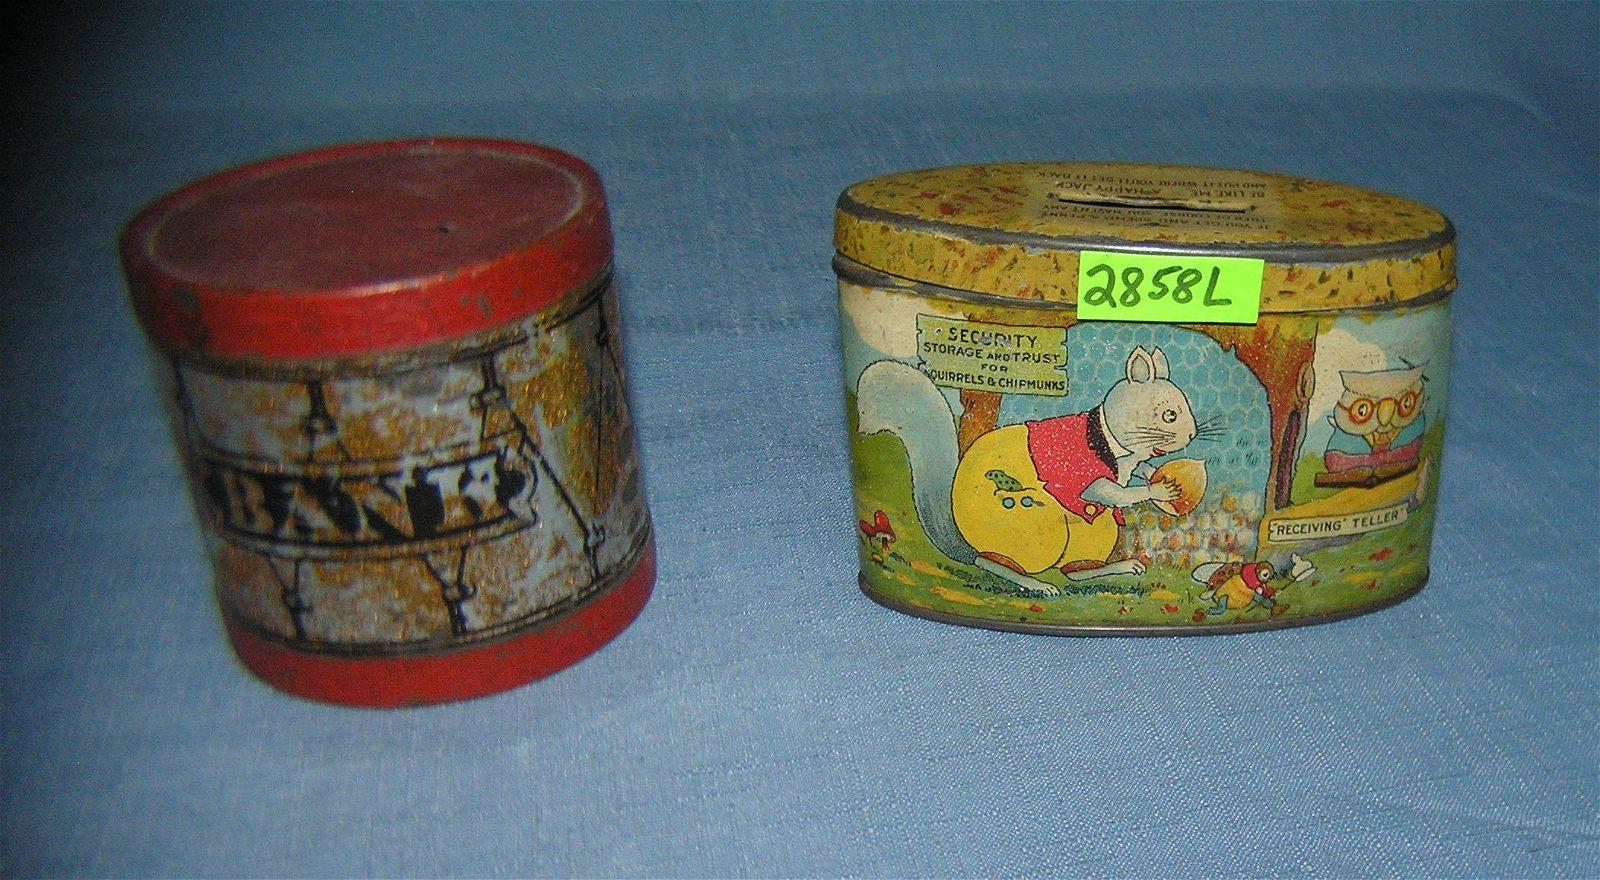 Pair of antique tin banks